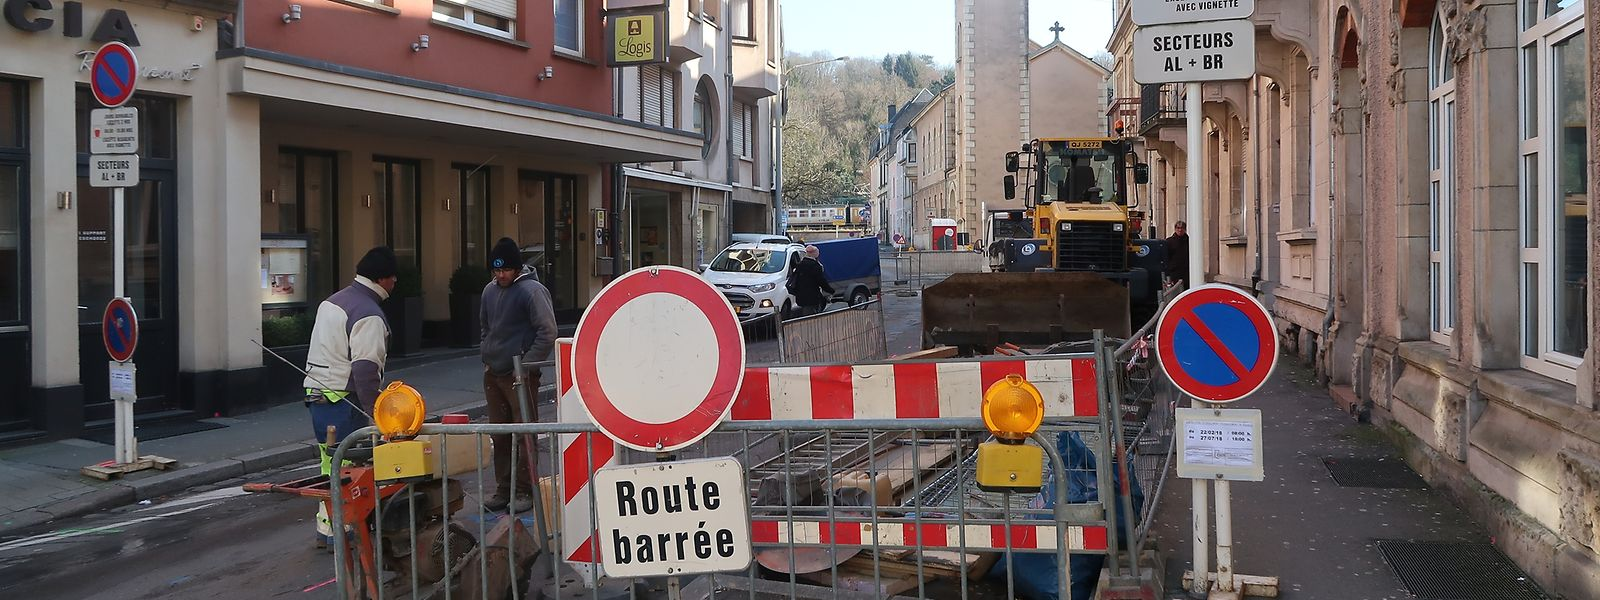 Seit Donnerstag ist ein Teil der Rue de la Libération gesperrt.